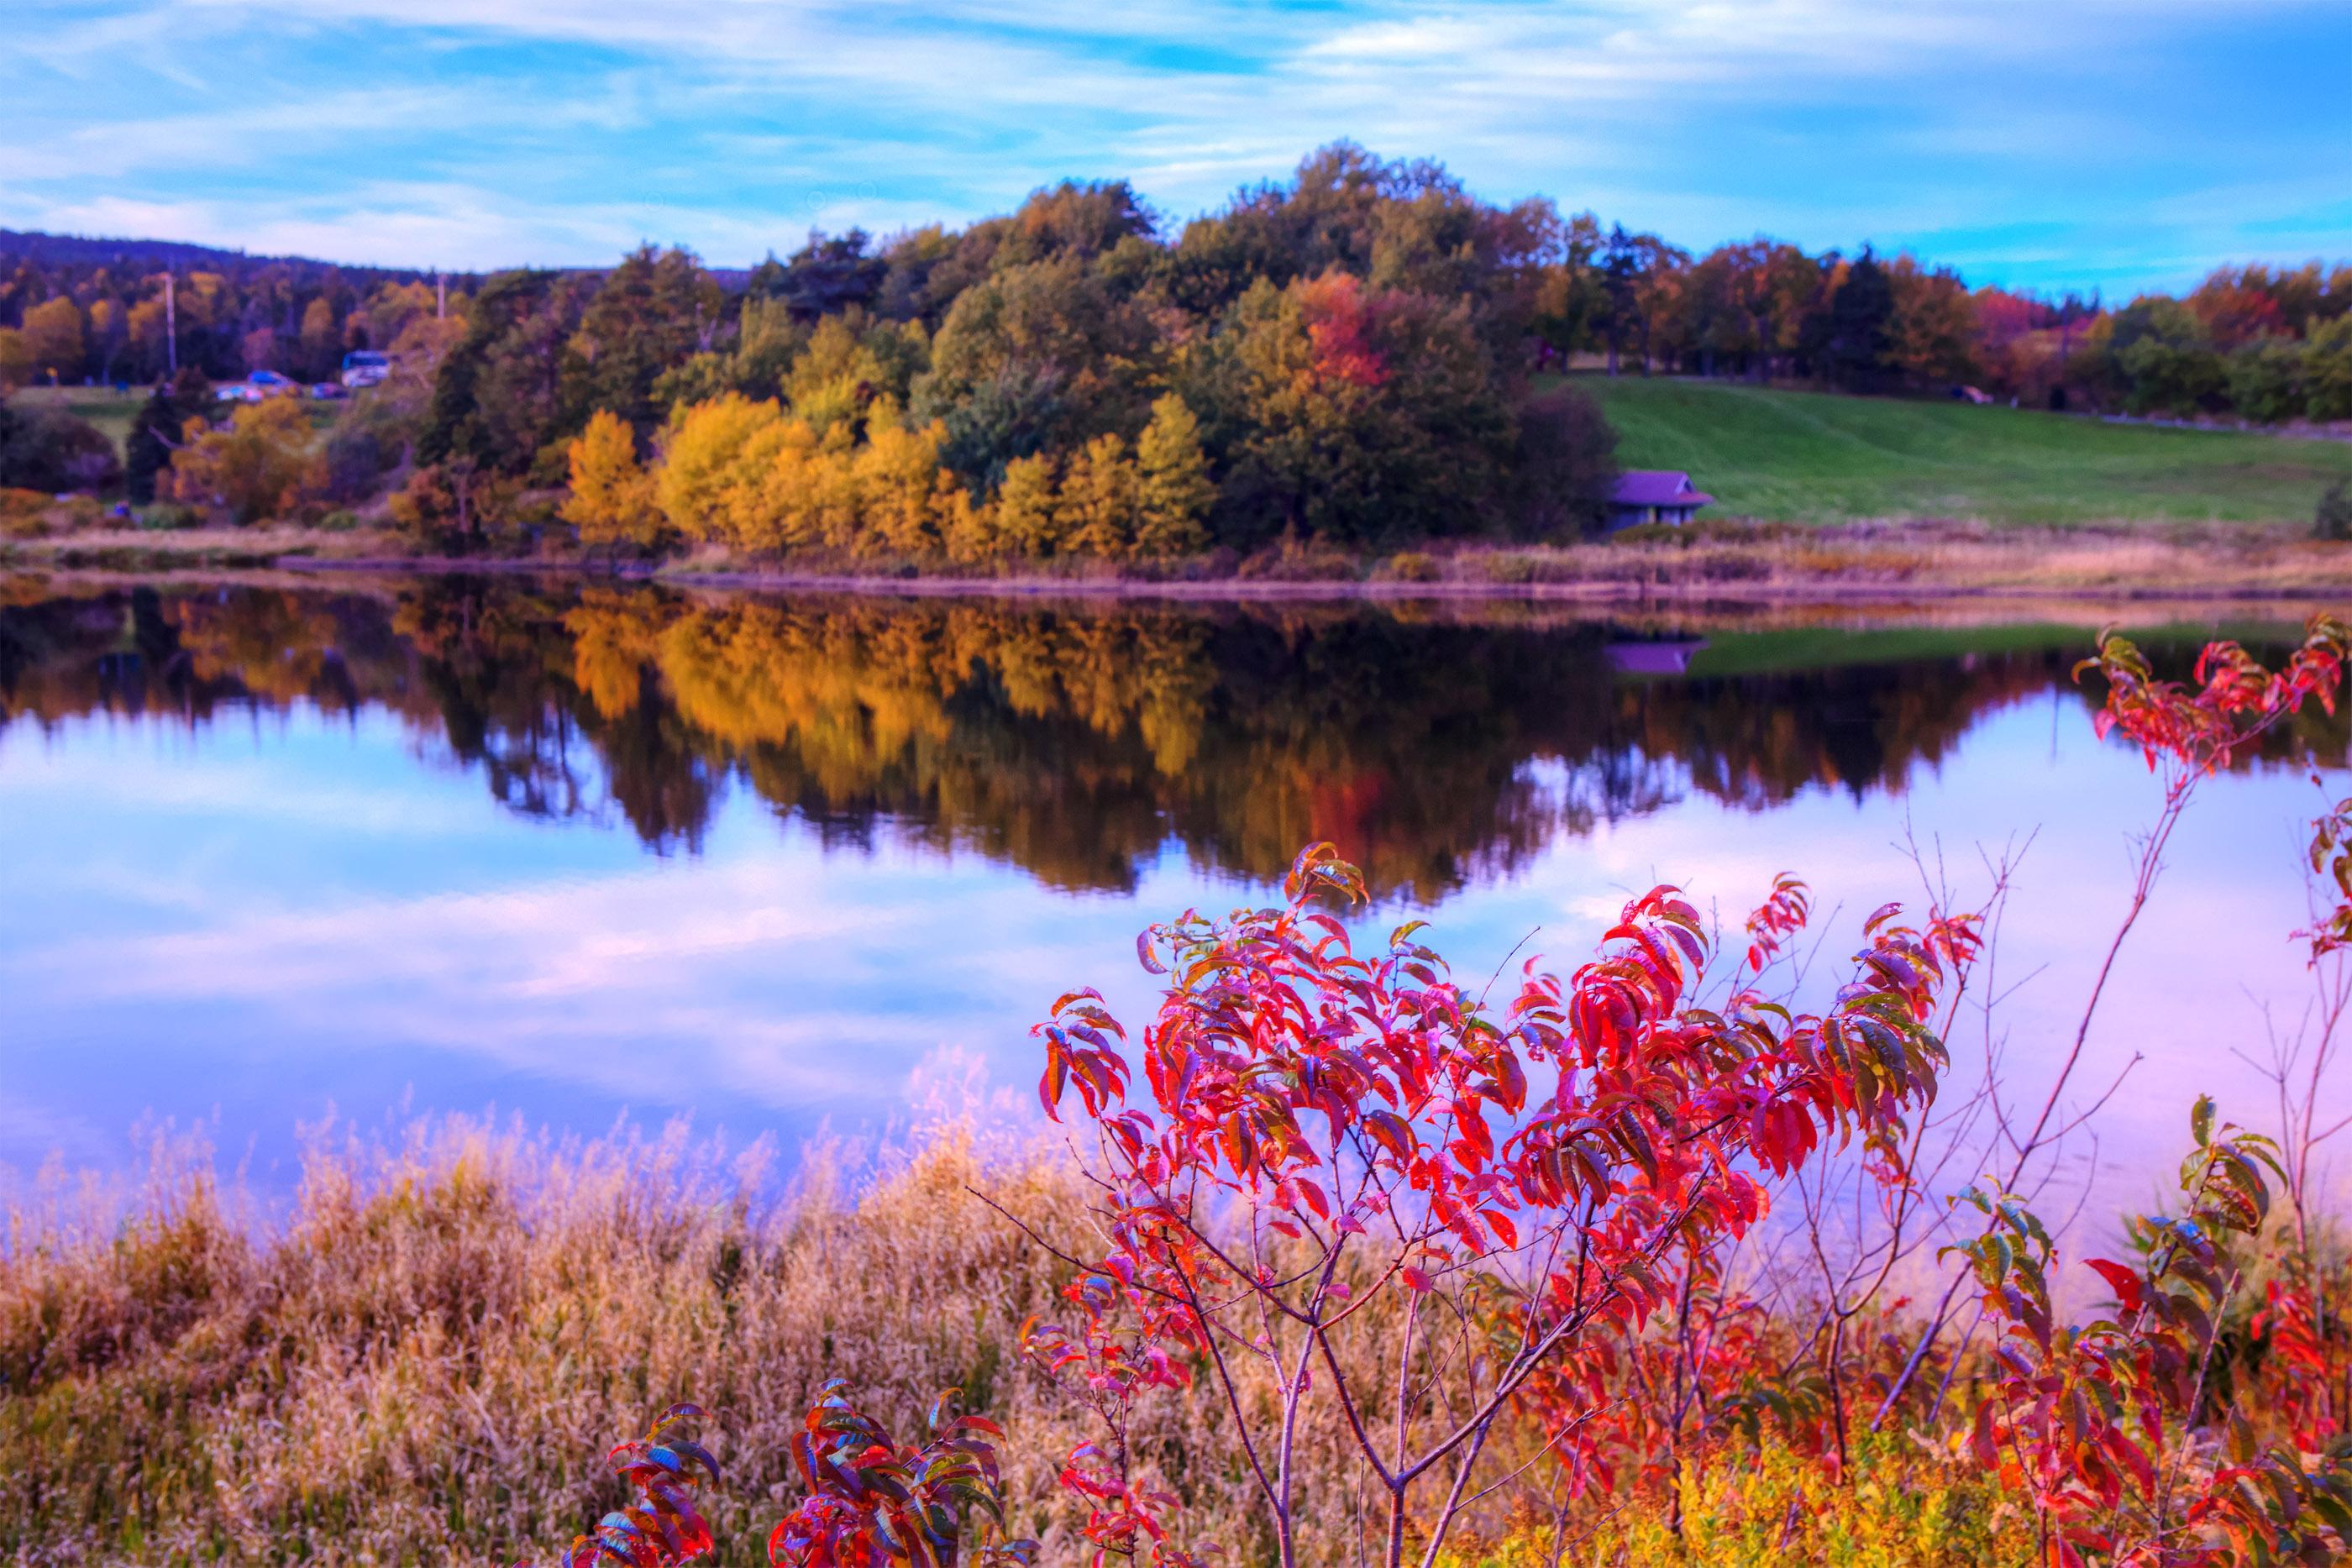 Autumn Lake, Reflection, Outdoors, Outside, Pink, HQ Photo